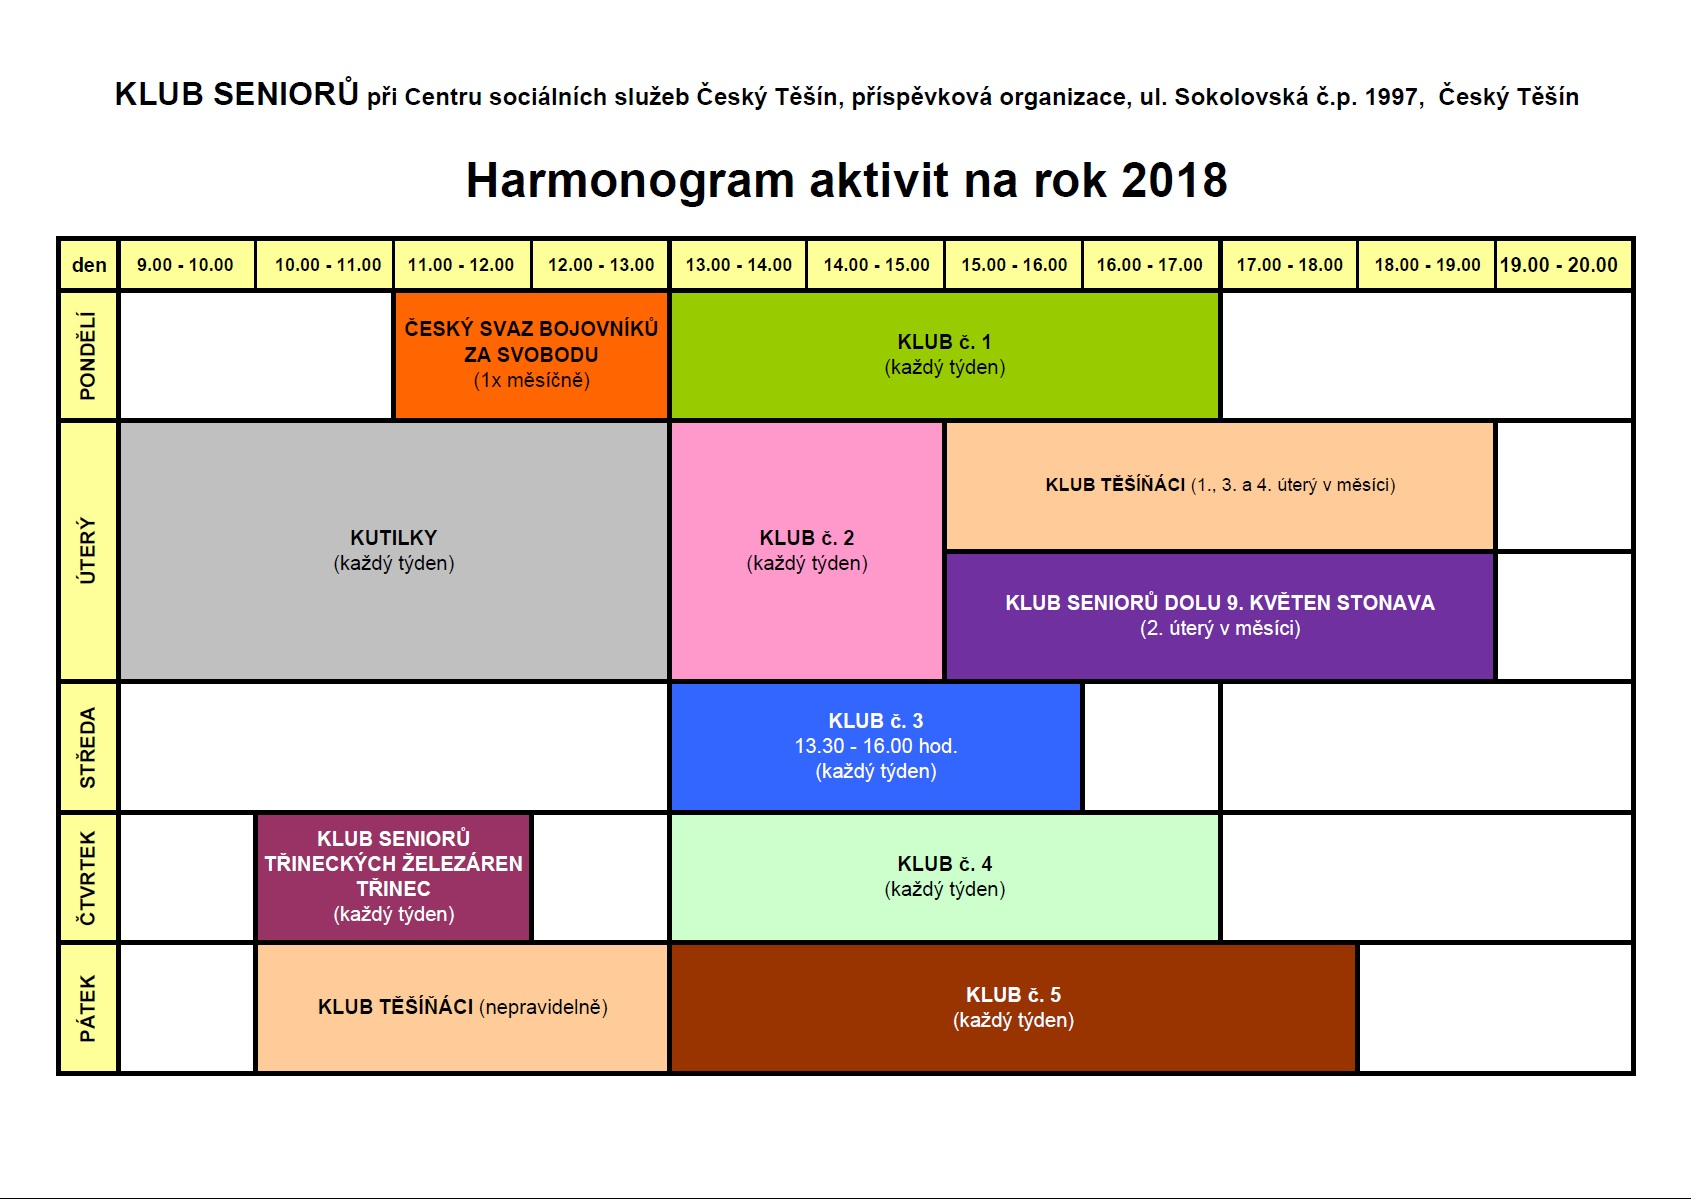 harmonogram-aktvit-senioru